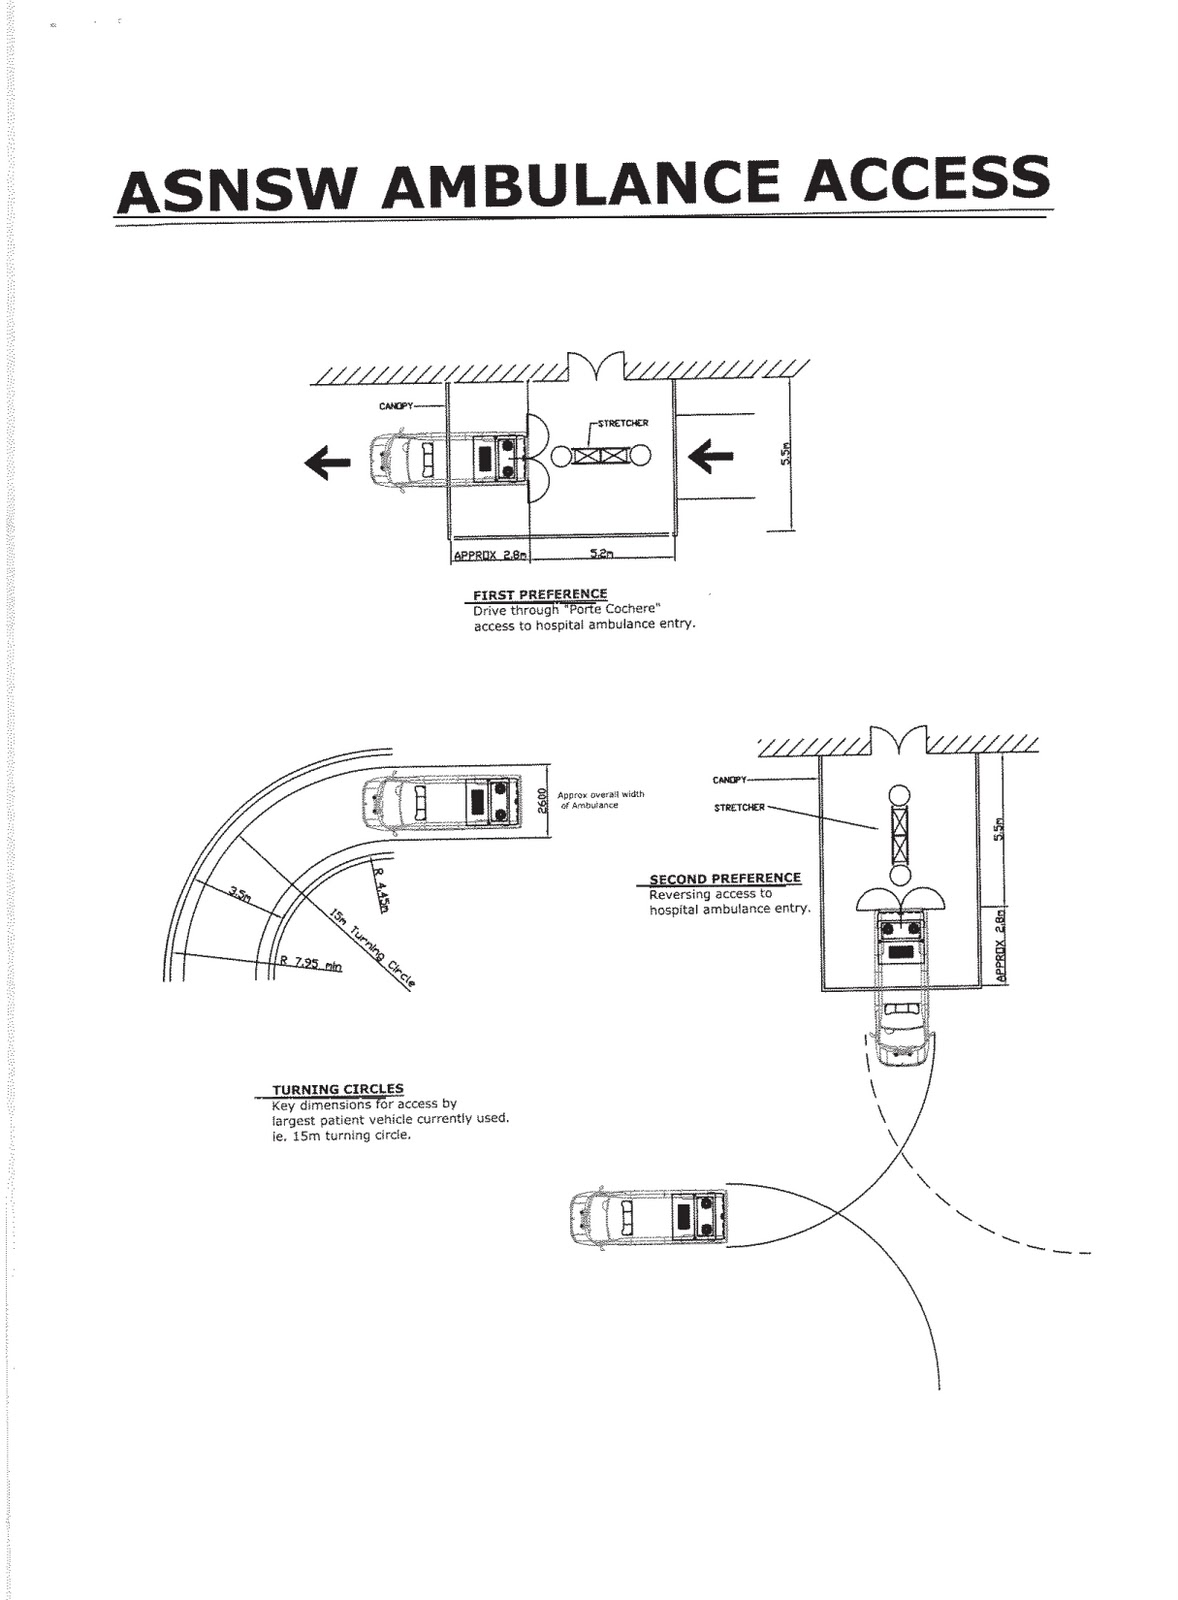 subaru stereo wiring harness diagram with 2000 Volvo Penta Wiring Stereo on 2000 Volvo Penta Wiring Stereo as well 370z Stereo Wiring Diagram further Wiring Harness Embly besides 1991 Toyota Pickup Wiring Diagram2008 Saturn Aura Wiring Diagram besides Jeep Grand Cherokee Radio Adaptor Wiring Harness.